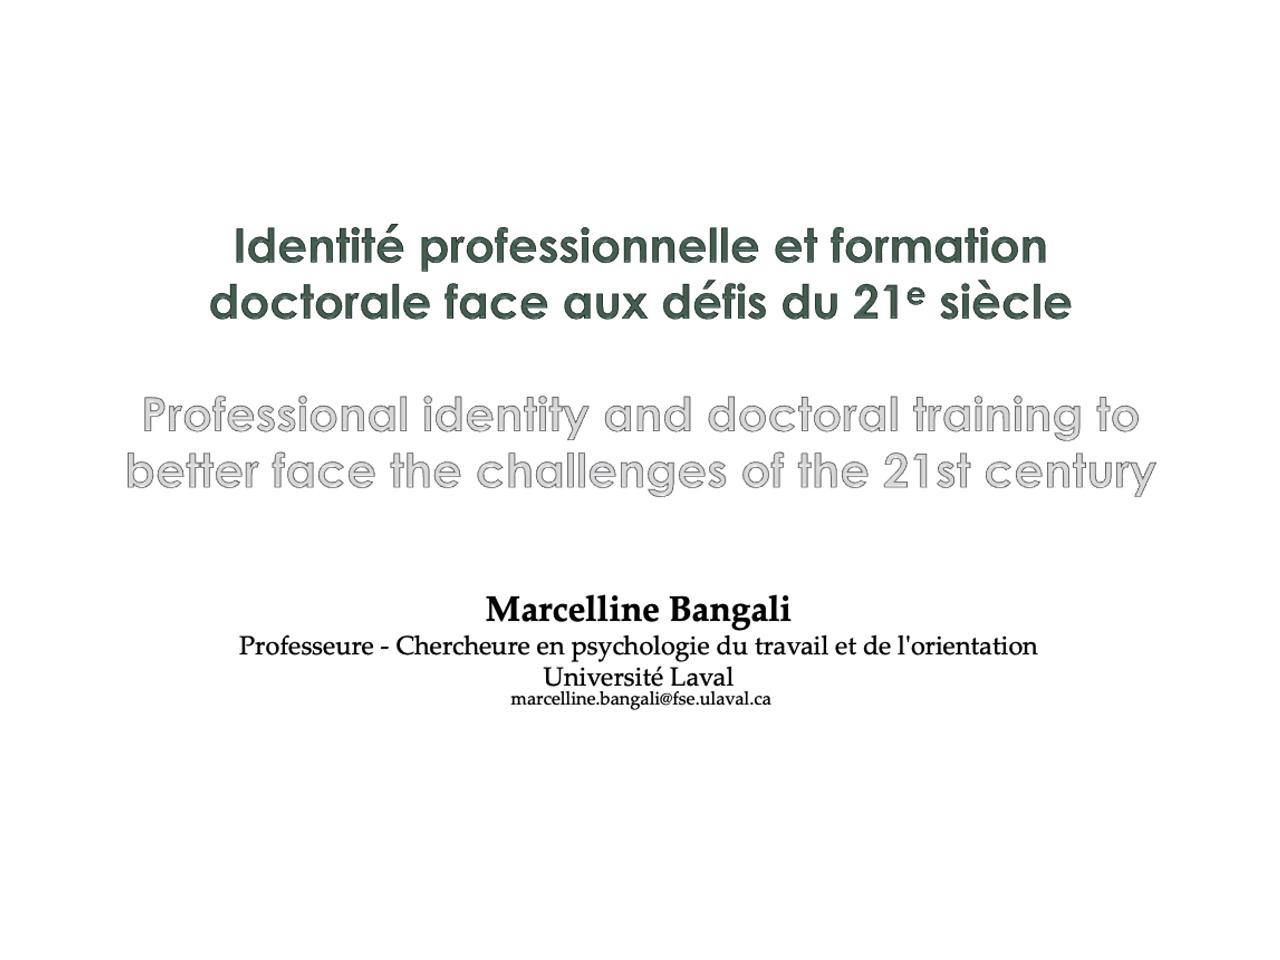 Marcelline Bangali